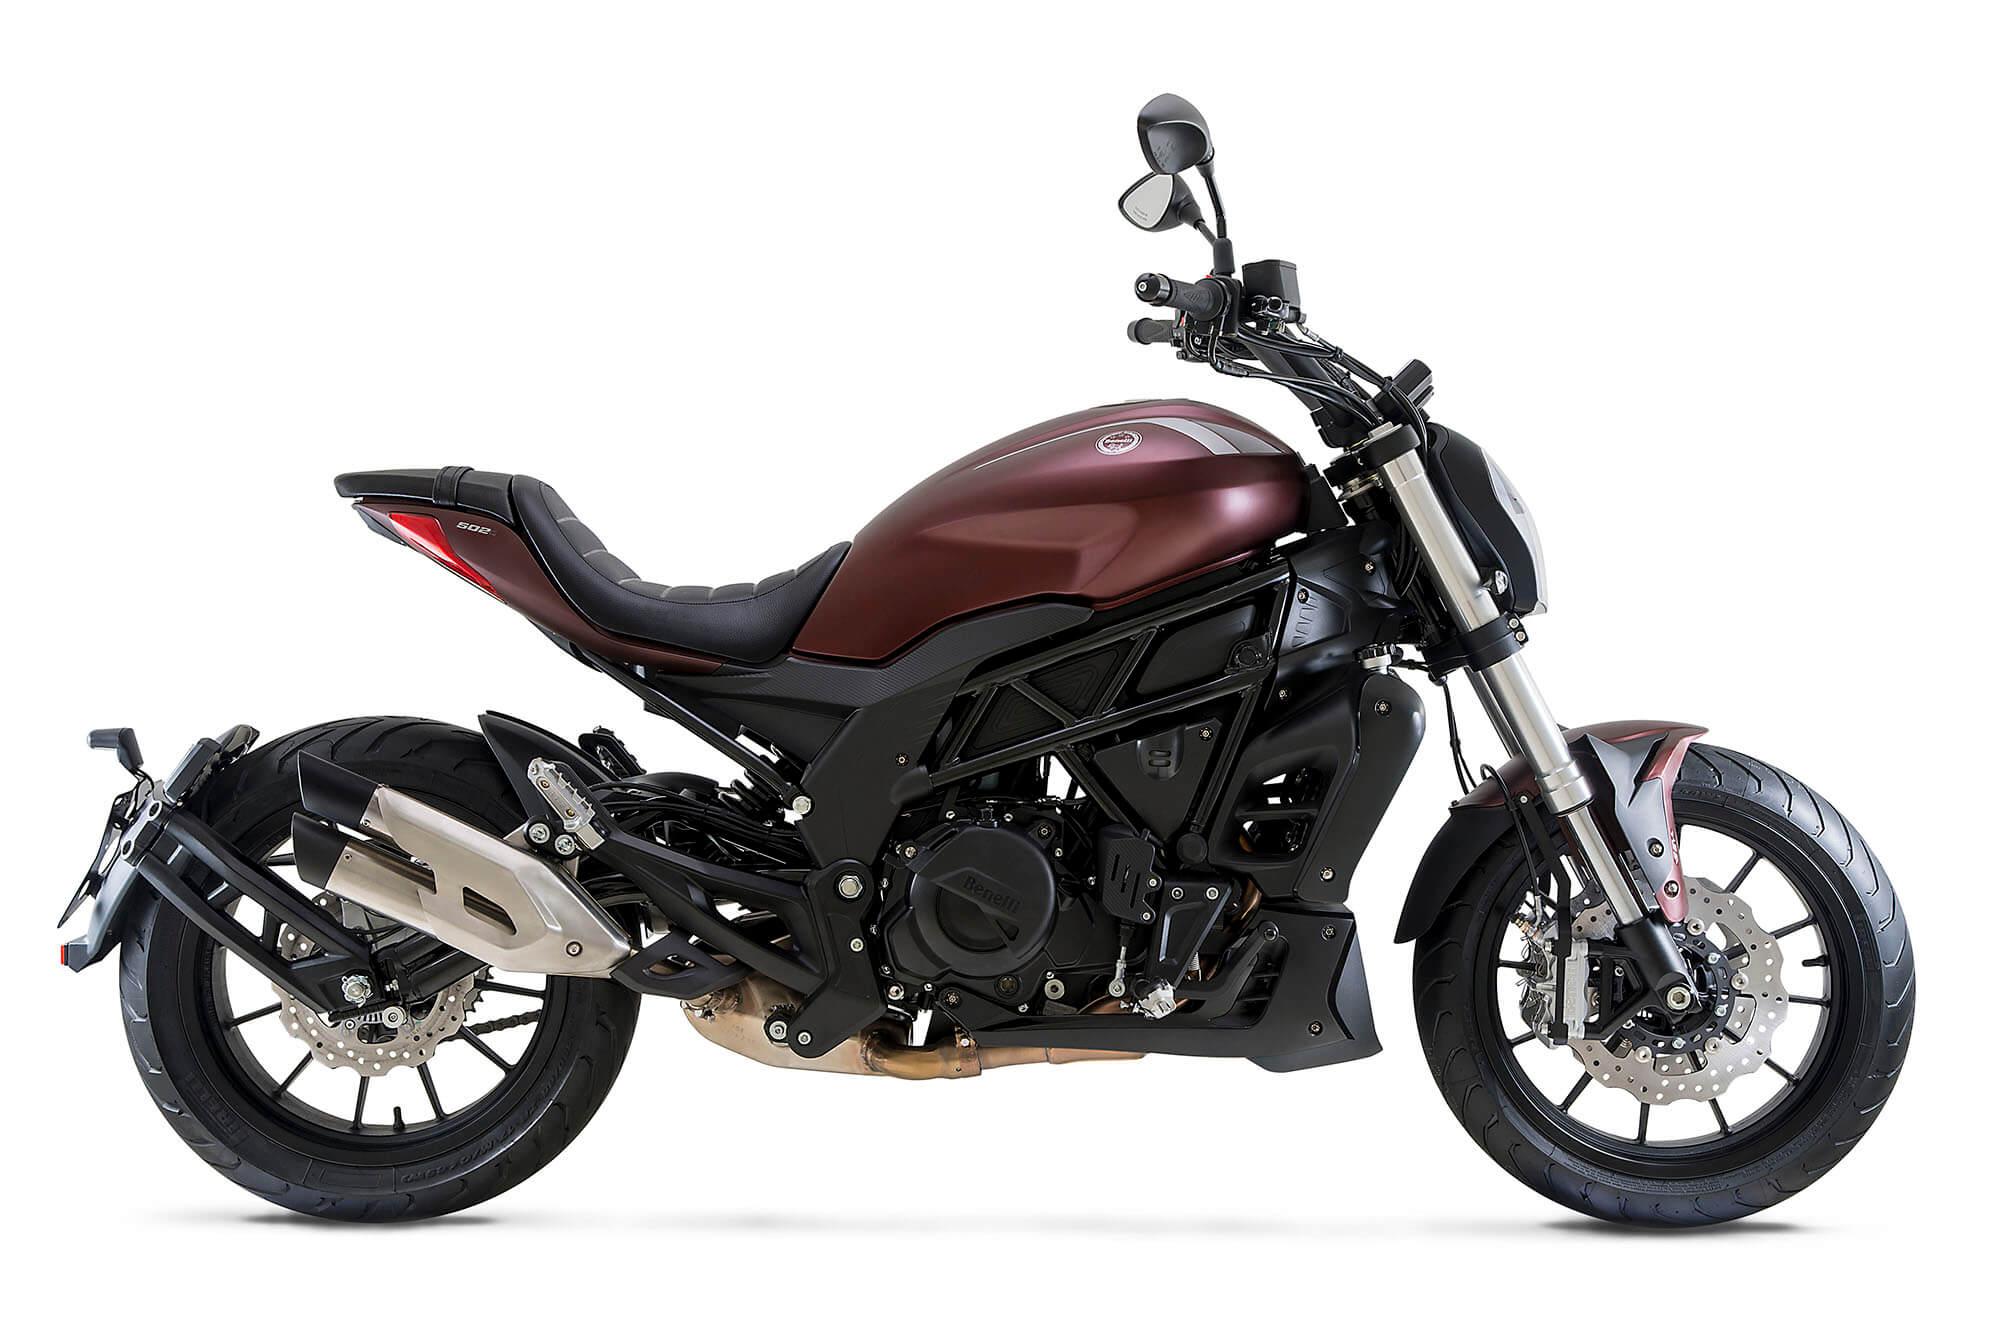 comprar-motos-benelli-502-C-granate-motissimo-barcelona